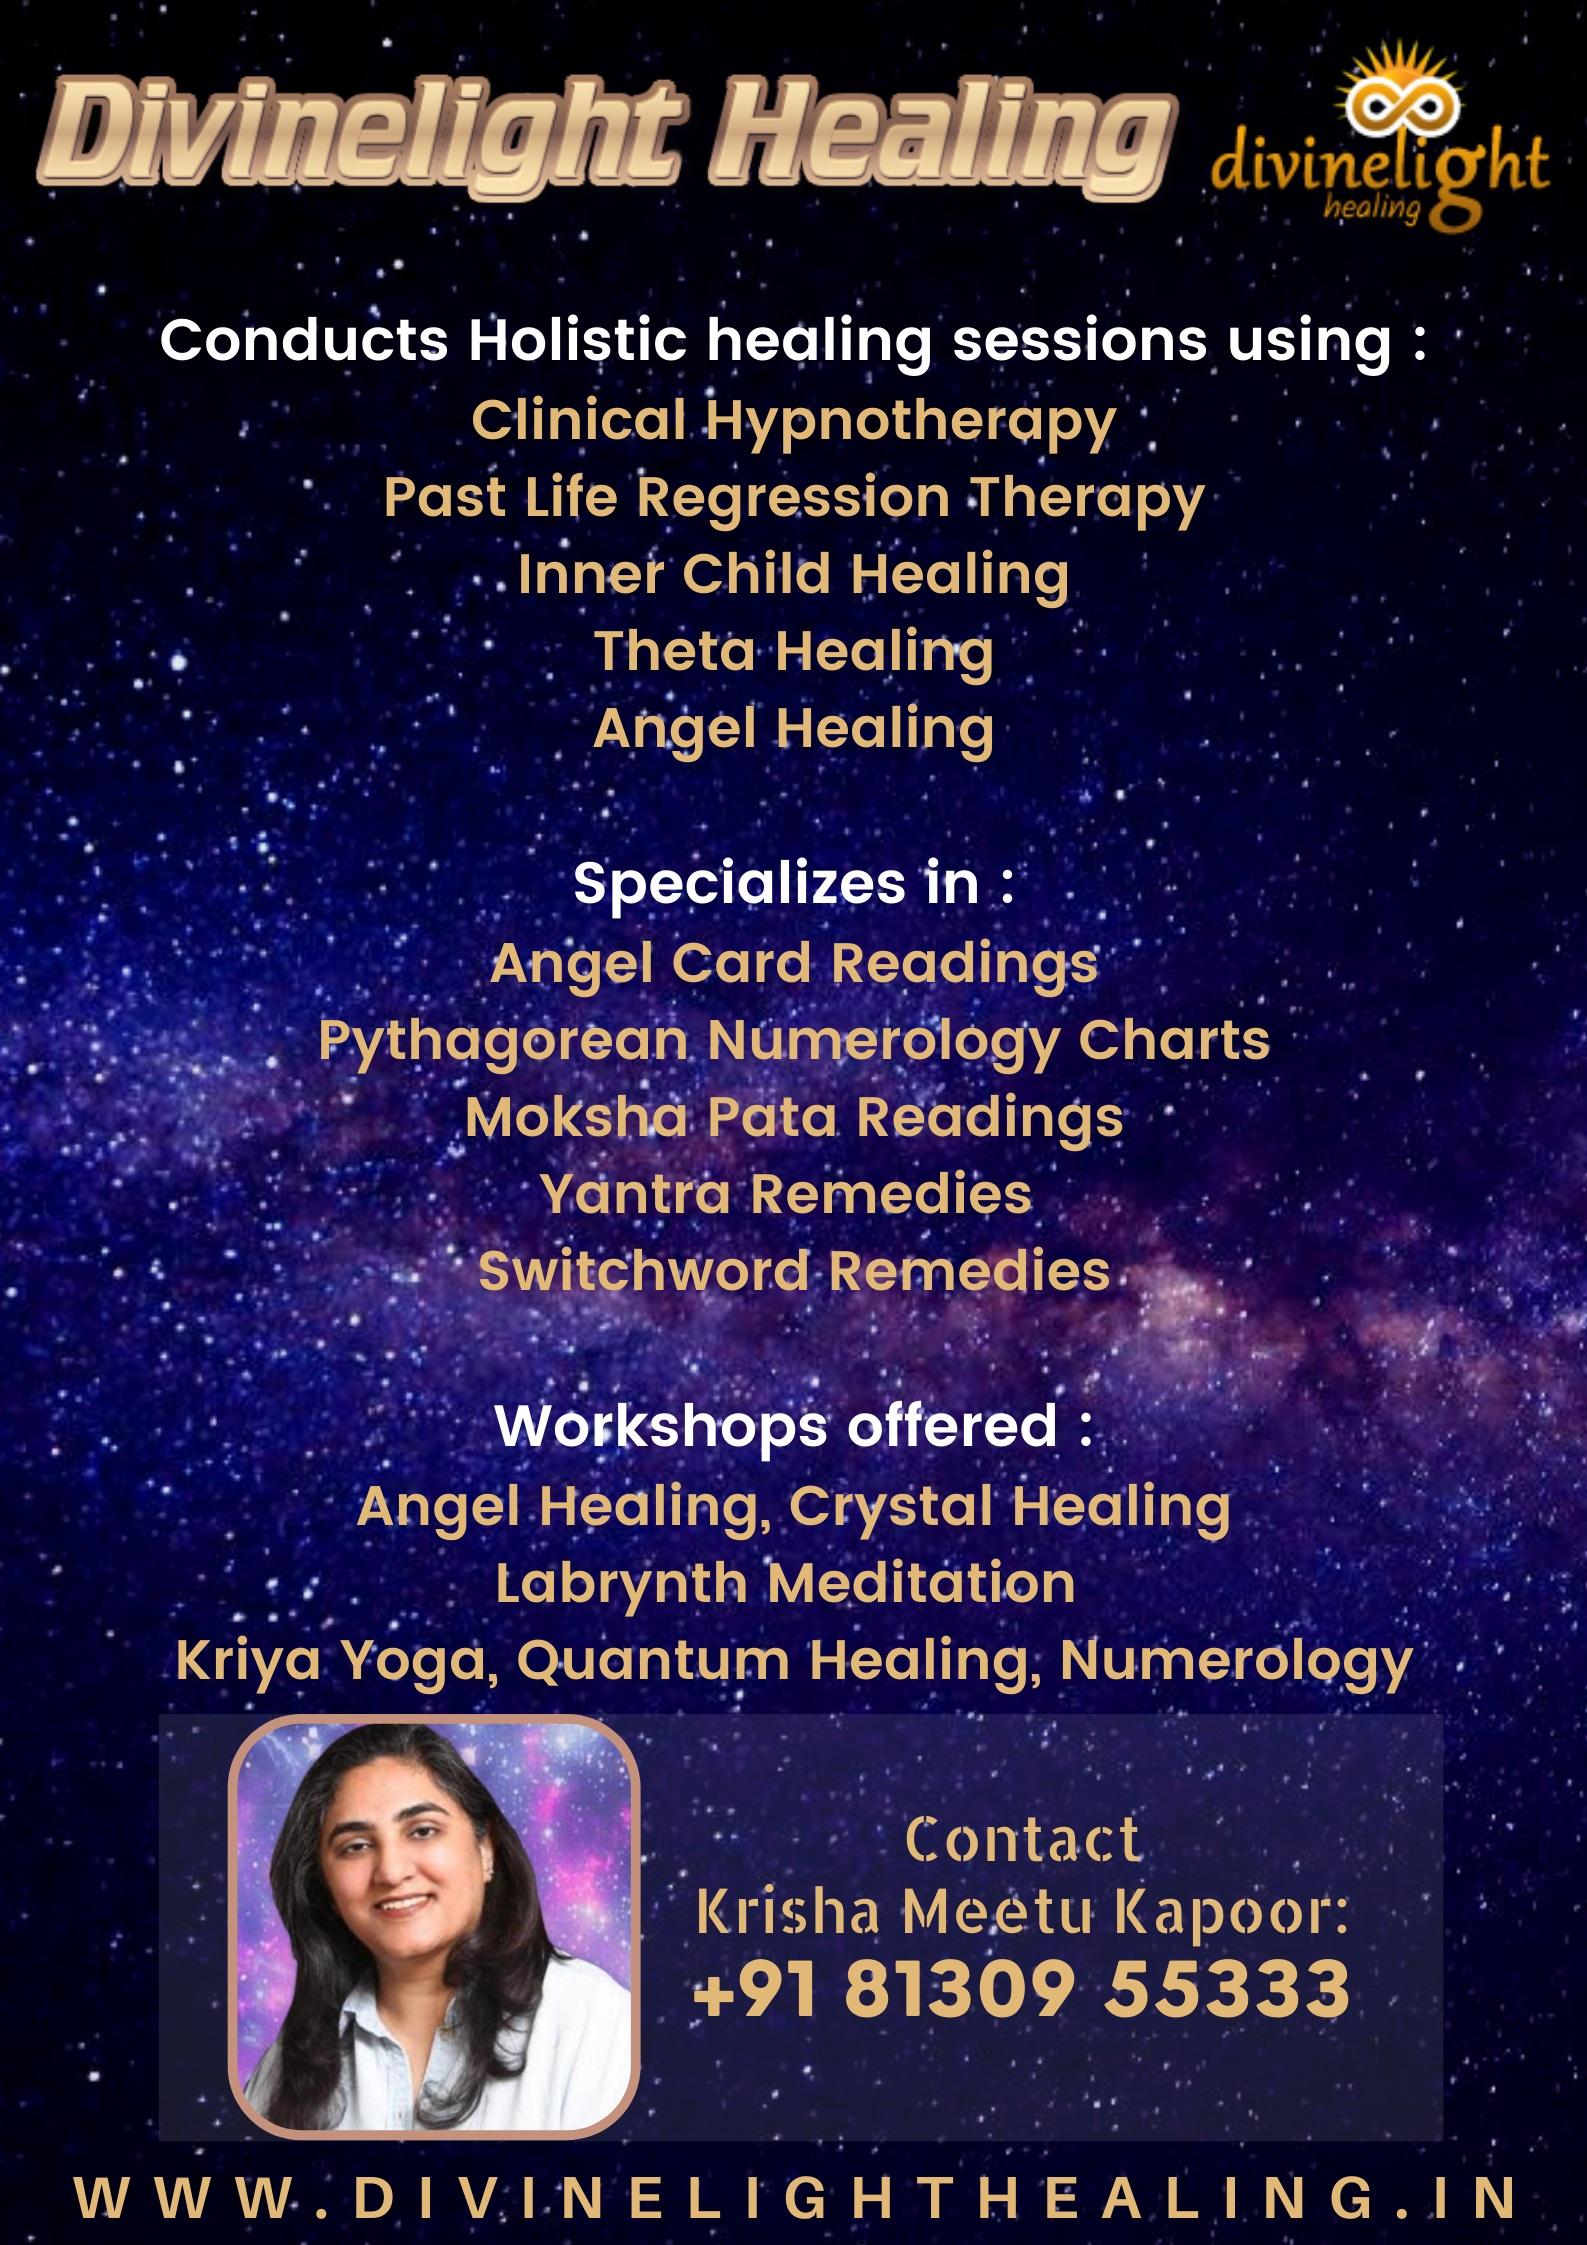 Divine Light Healing - Ms  Krisha Meetu Kapoor